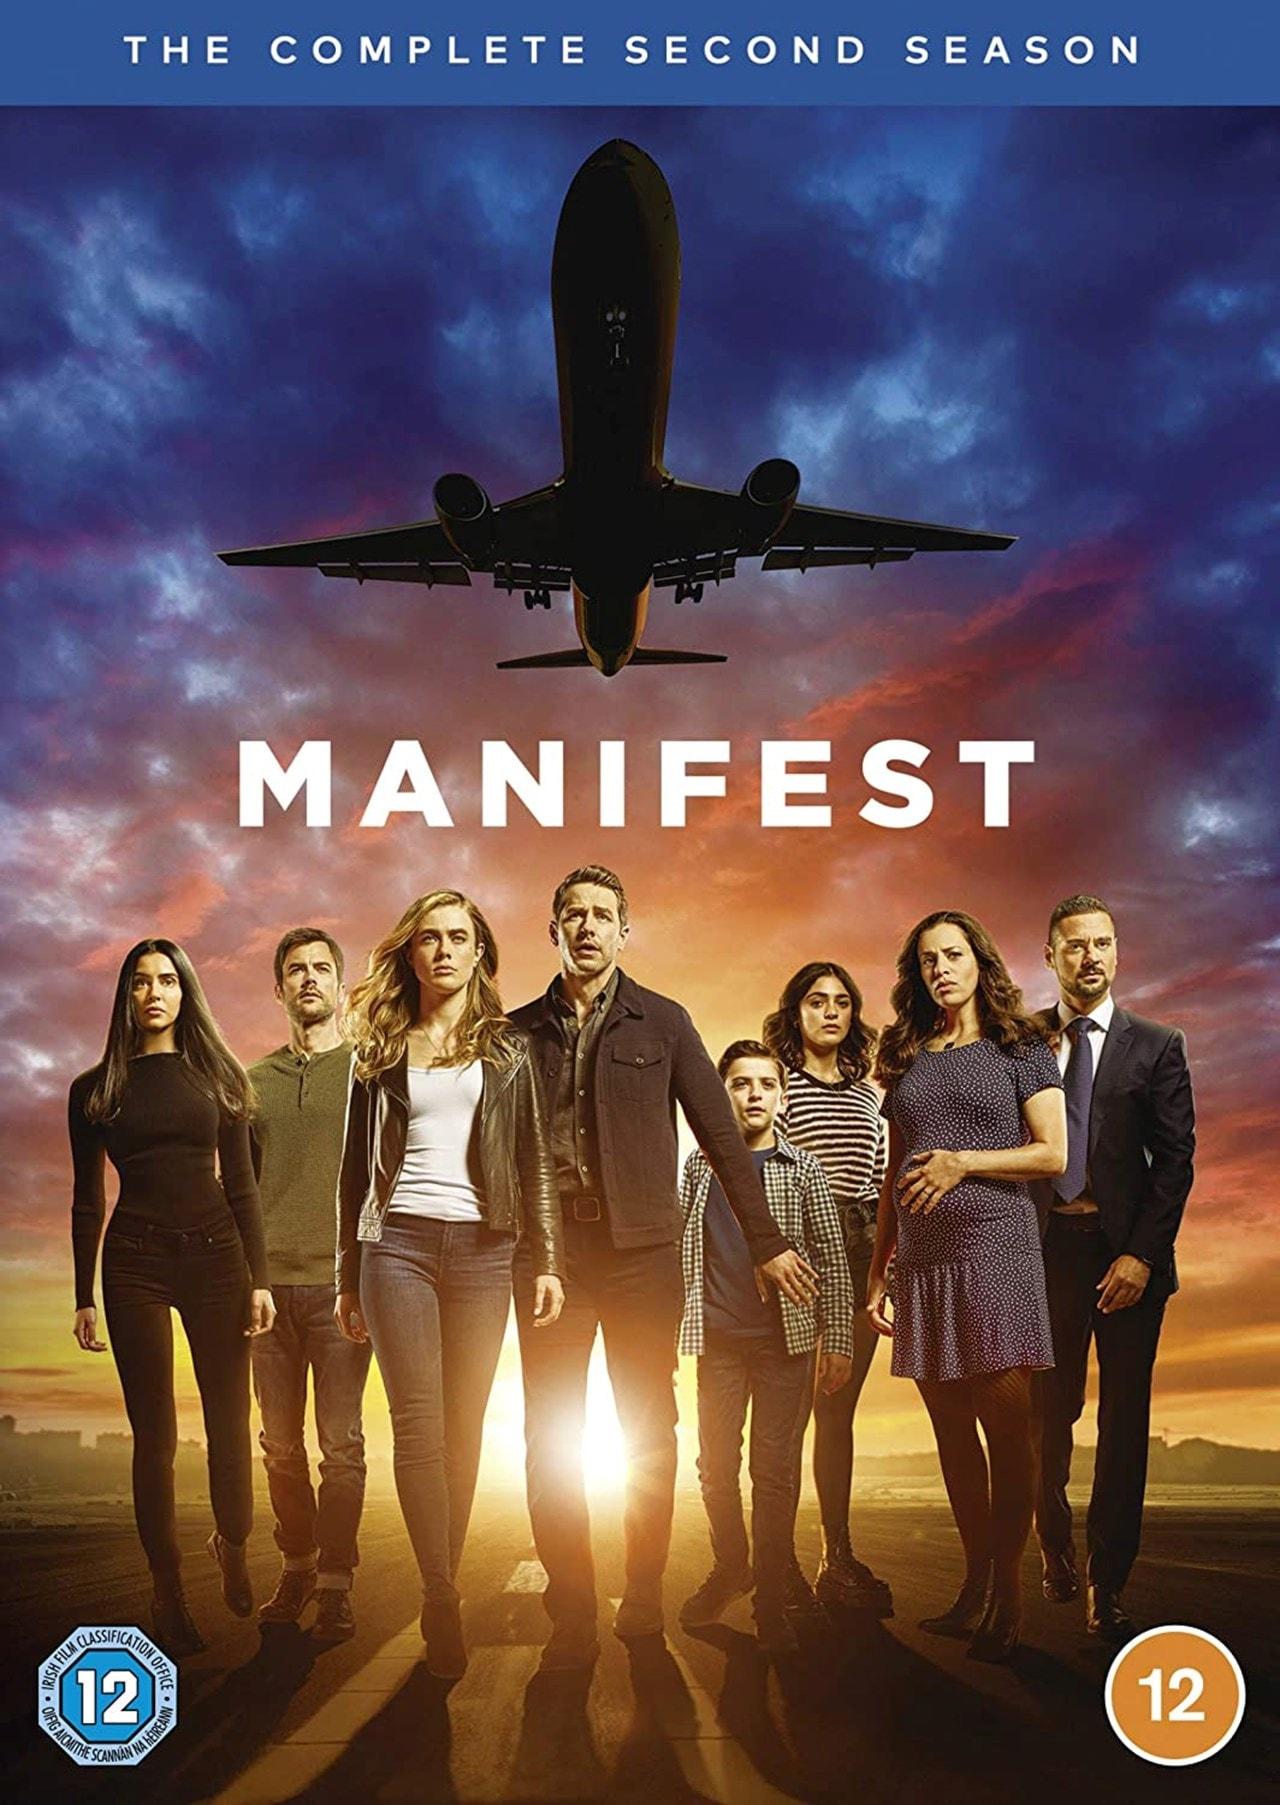 Manifest: The Complete Second Season - 1